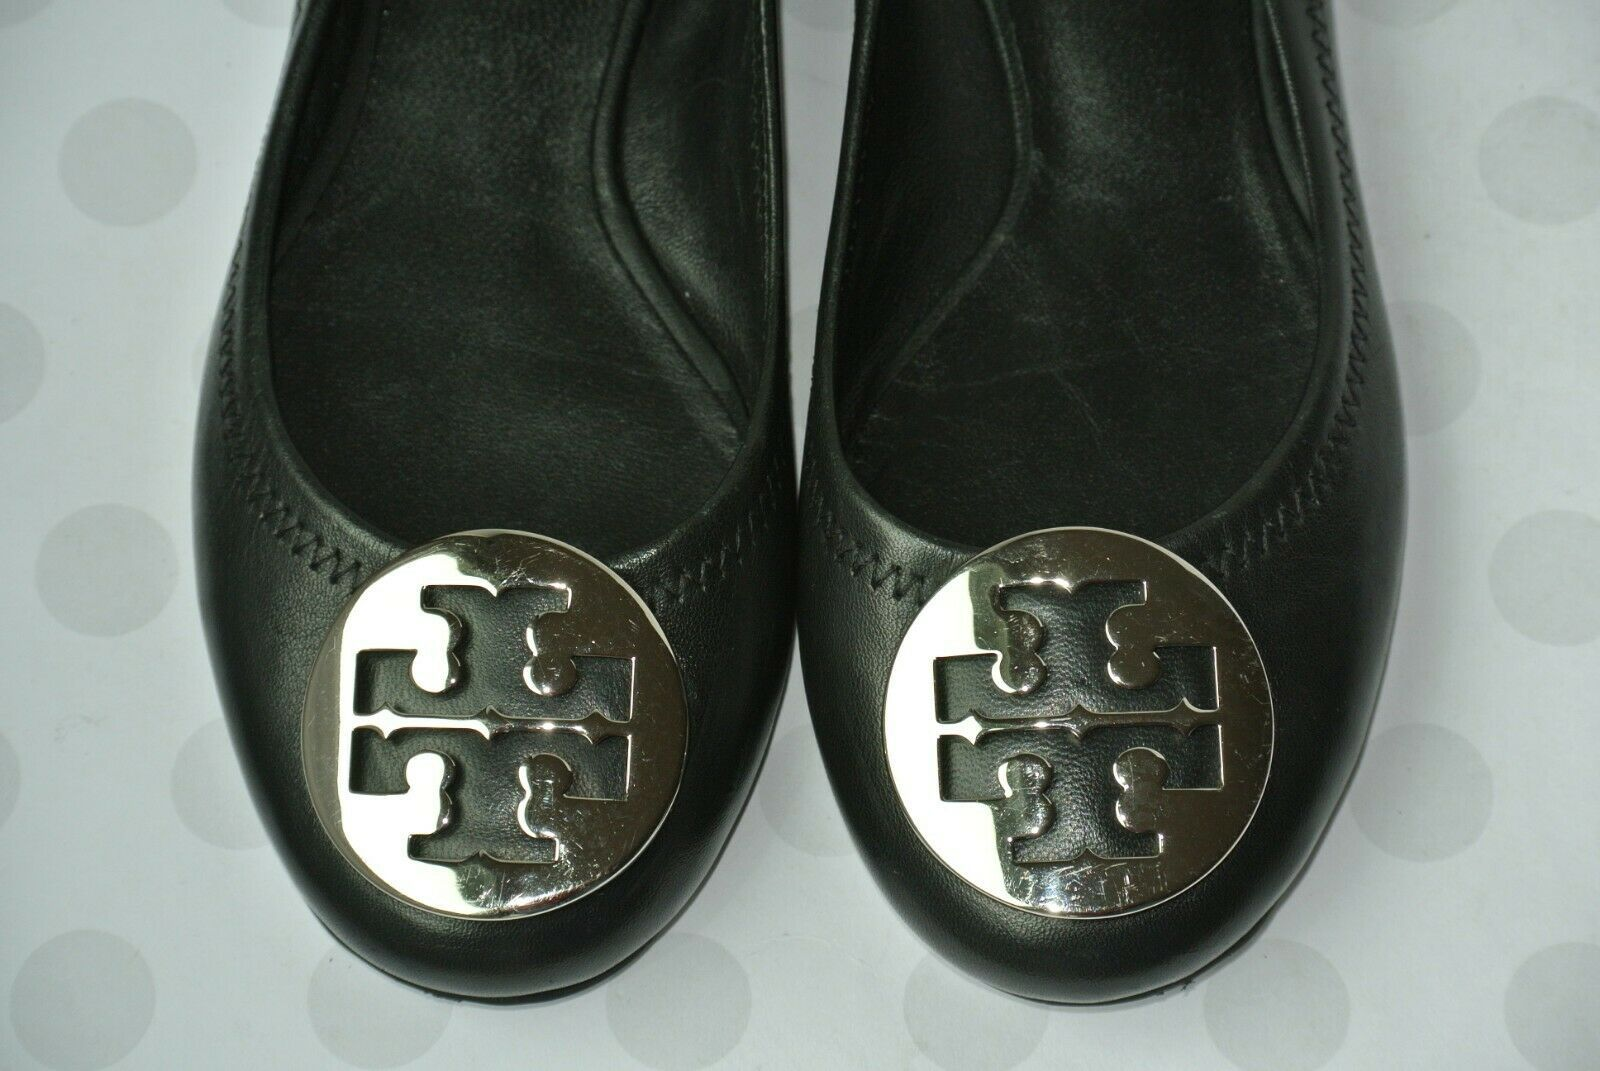 Tory Burch Reva Womens Sz 4.5 M Black Leather Ballet Flats EXCELLENT!